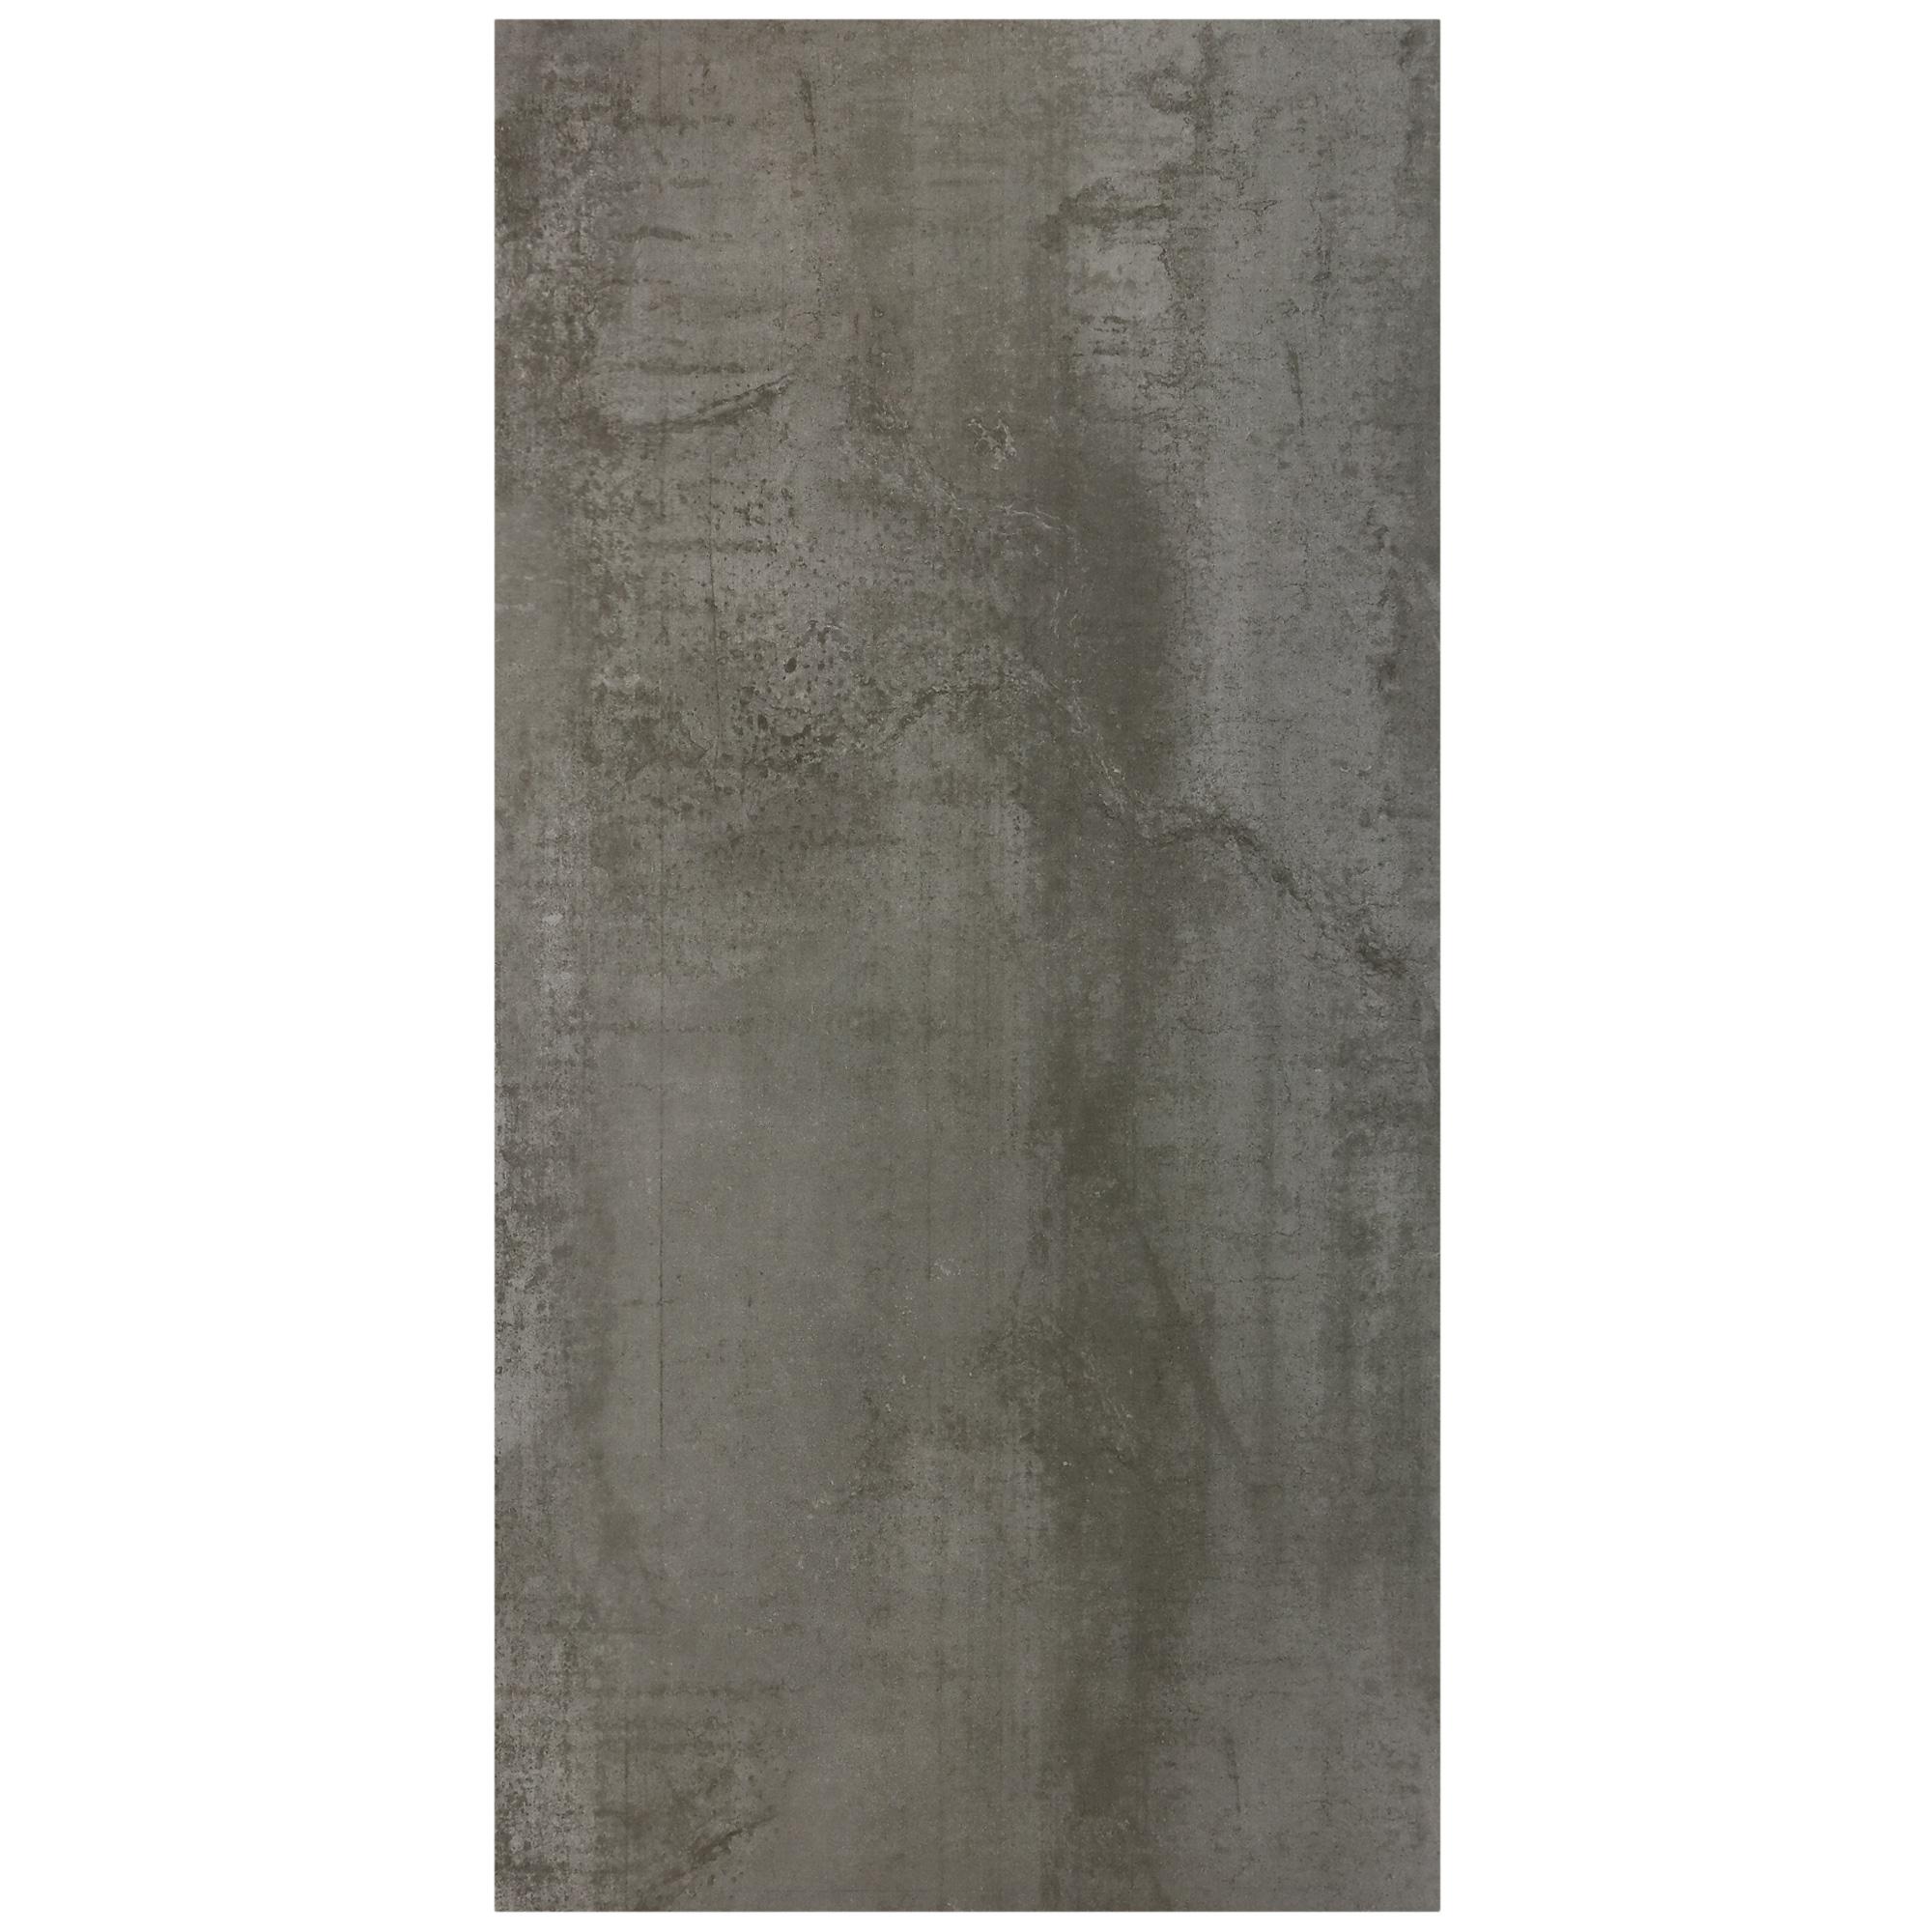 Плитка Cifre METAL SILVER 60X120 УП2 плитка cifre ceramica lotus black pulido 60x120 см